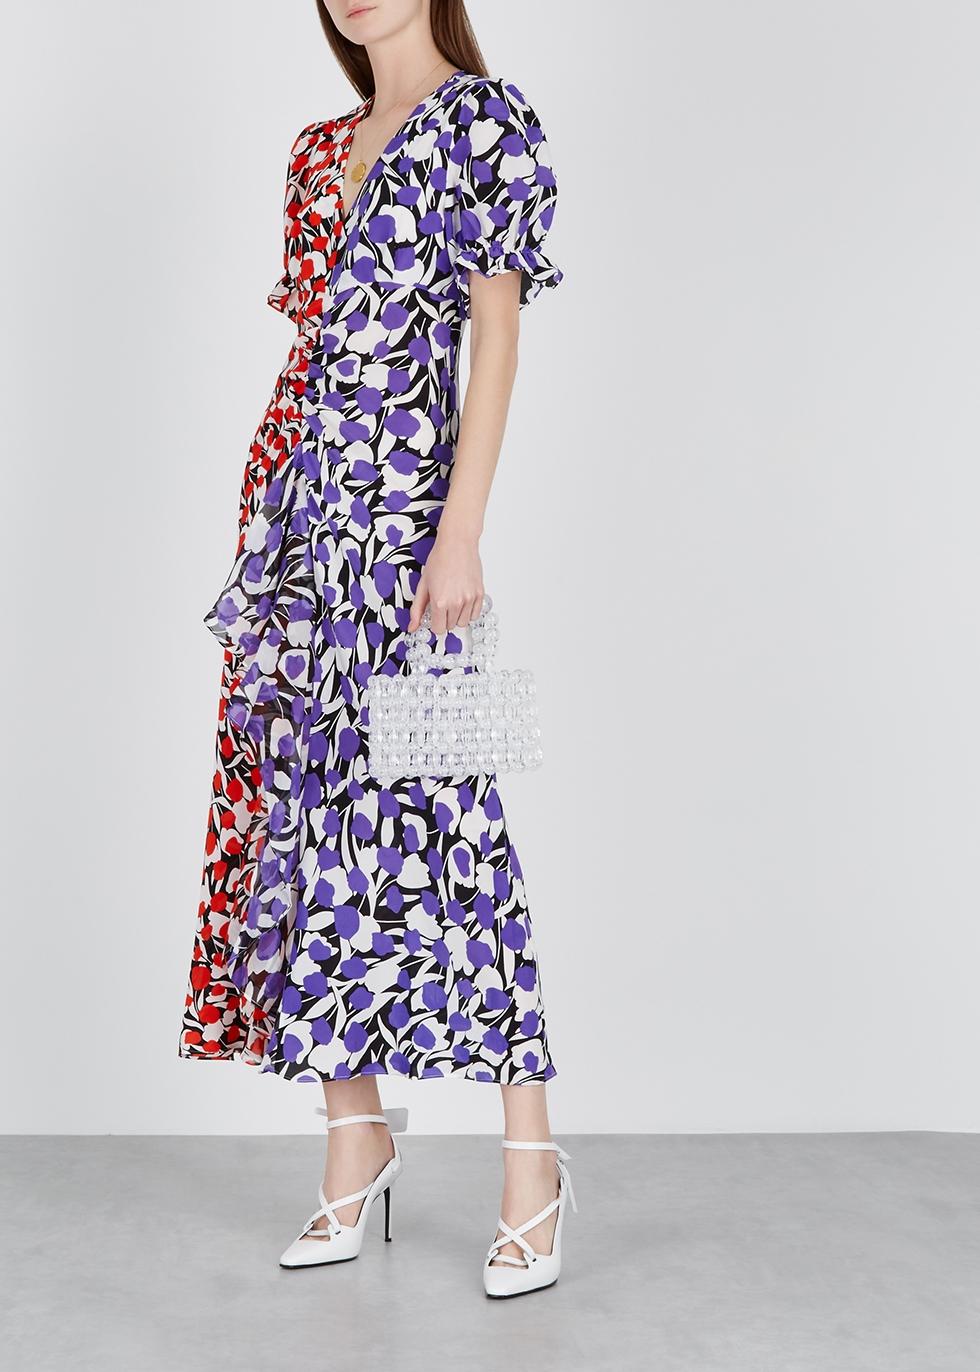 0fee6cd7fbe2 Designer Dresses   Designer Gowns - Harvey Nichols